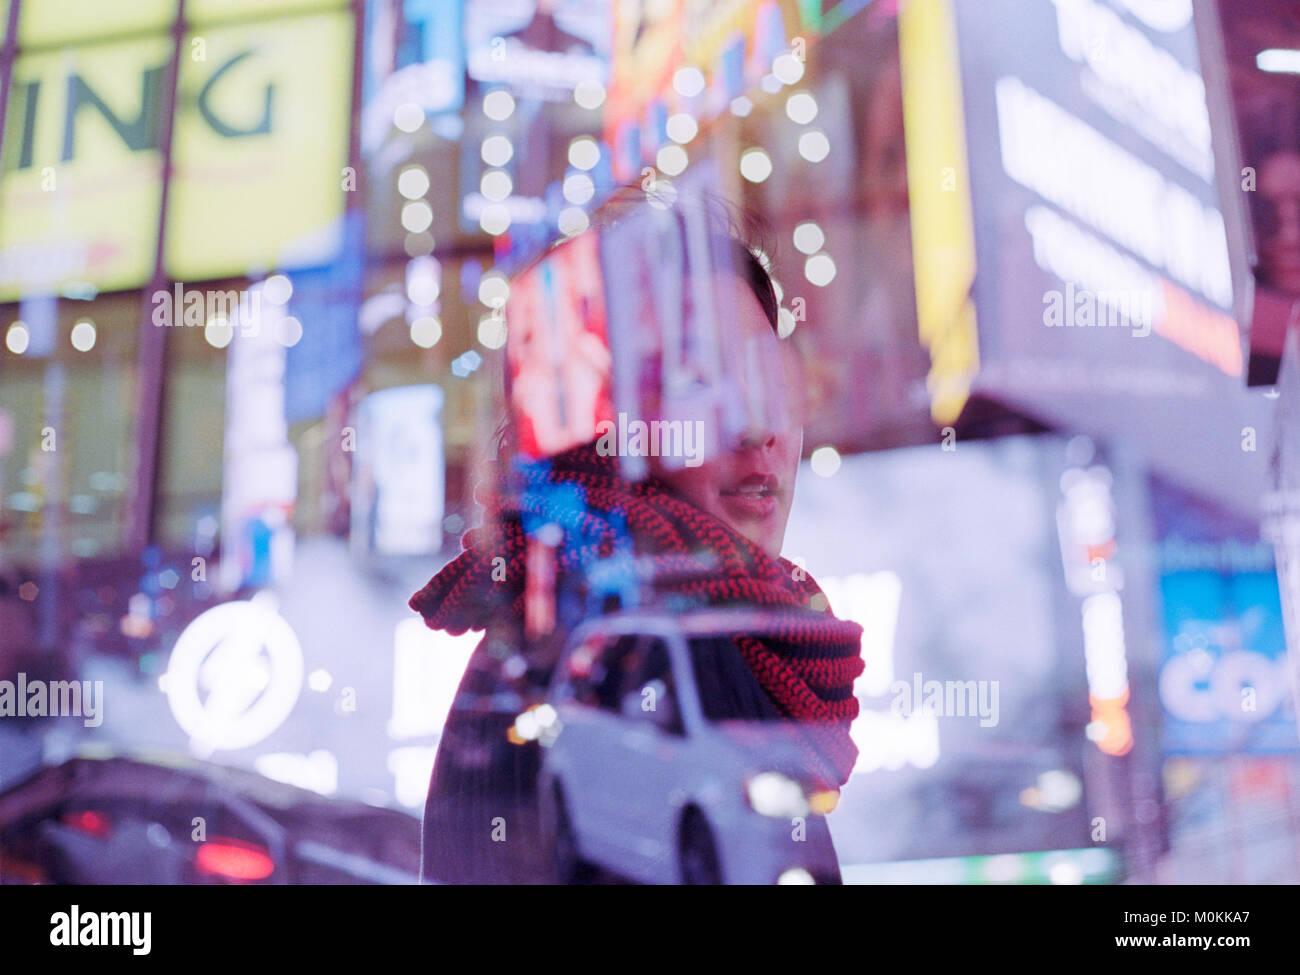 Doppel der asiatischen Frau in New York City Exposition, Times Square Stockbild